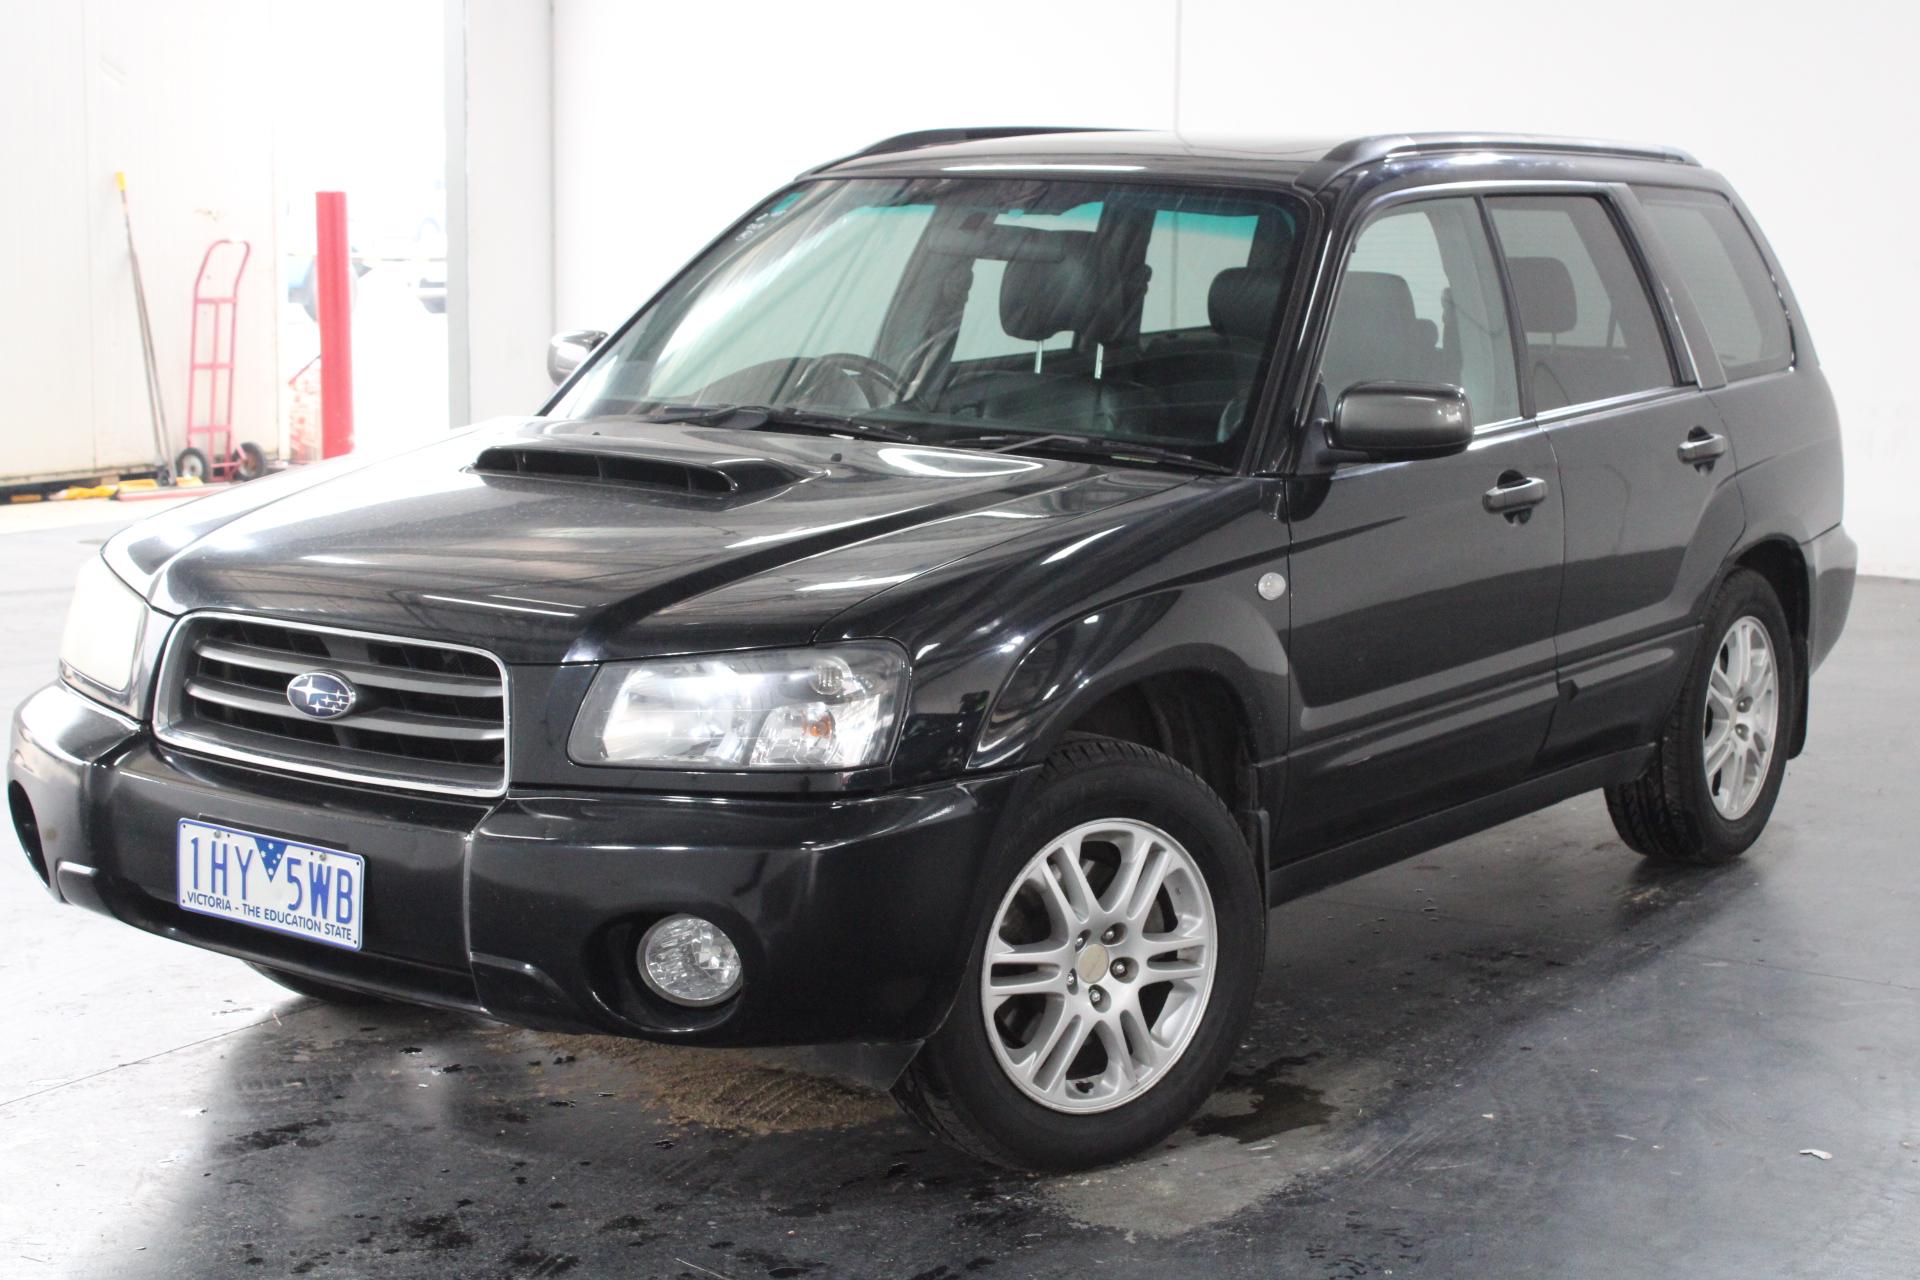 2004 Subaru Forester XT Automatic Wagon